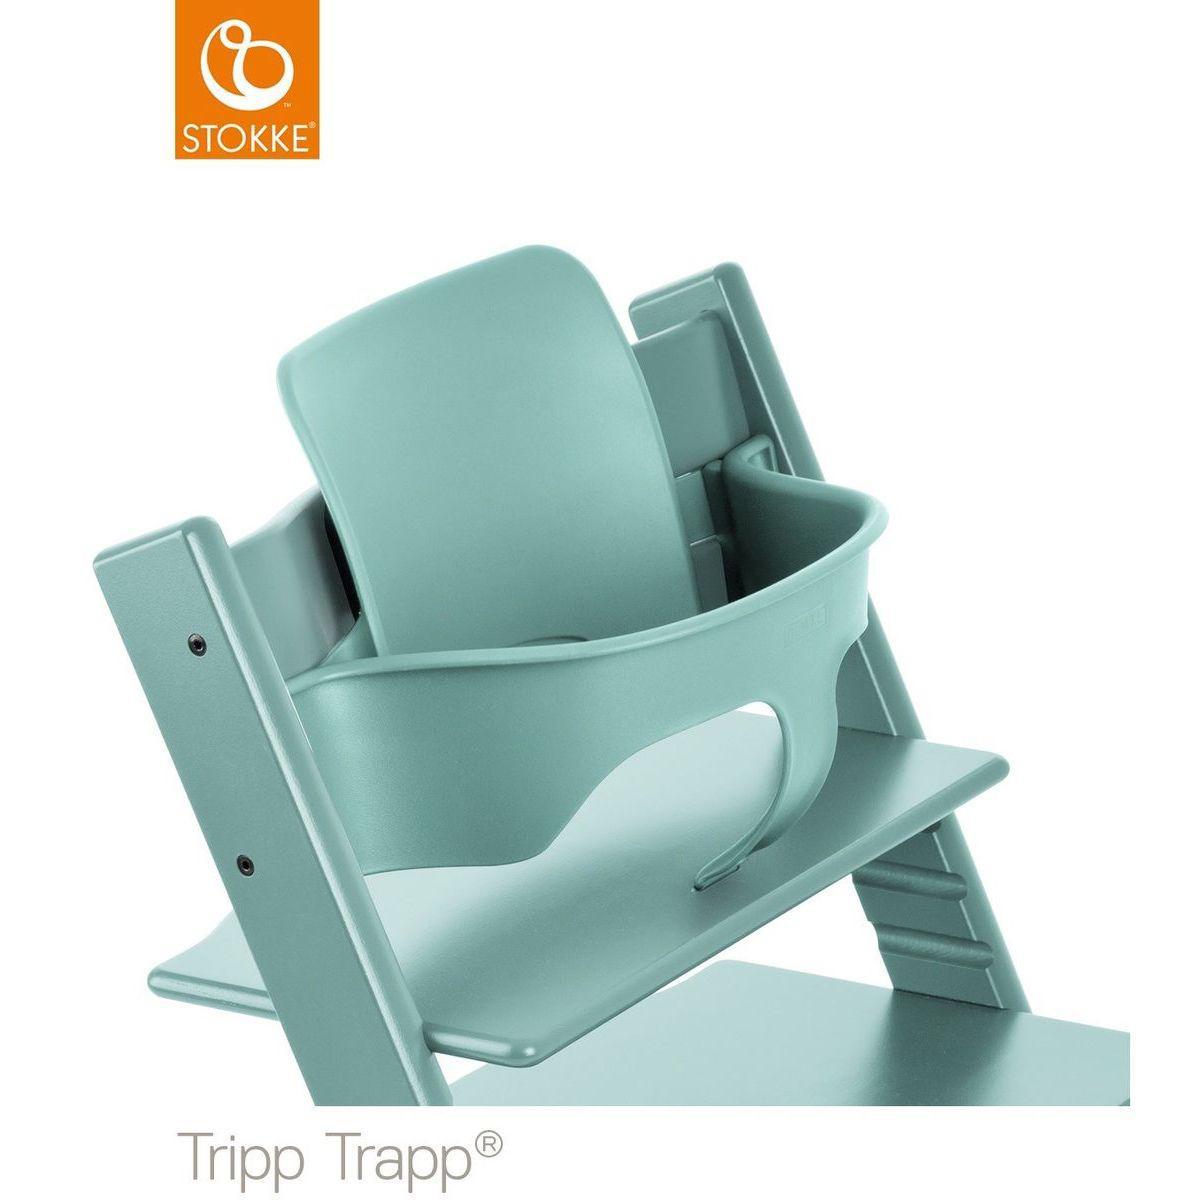 Baby Set Hochstuhl TRIPP TRAPP Stokke aqua blue